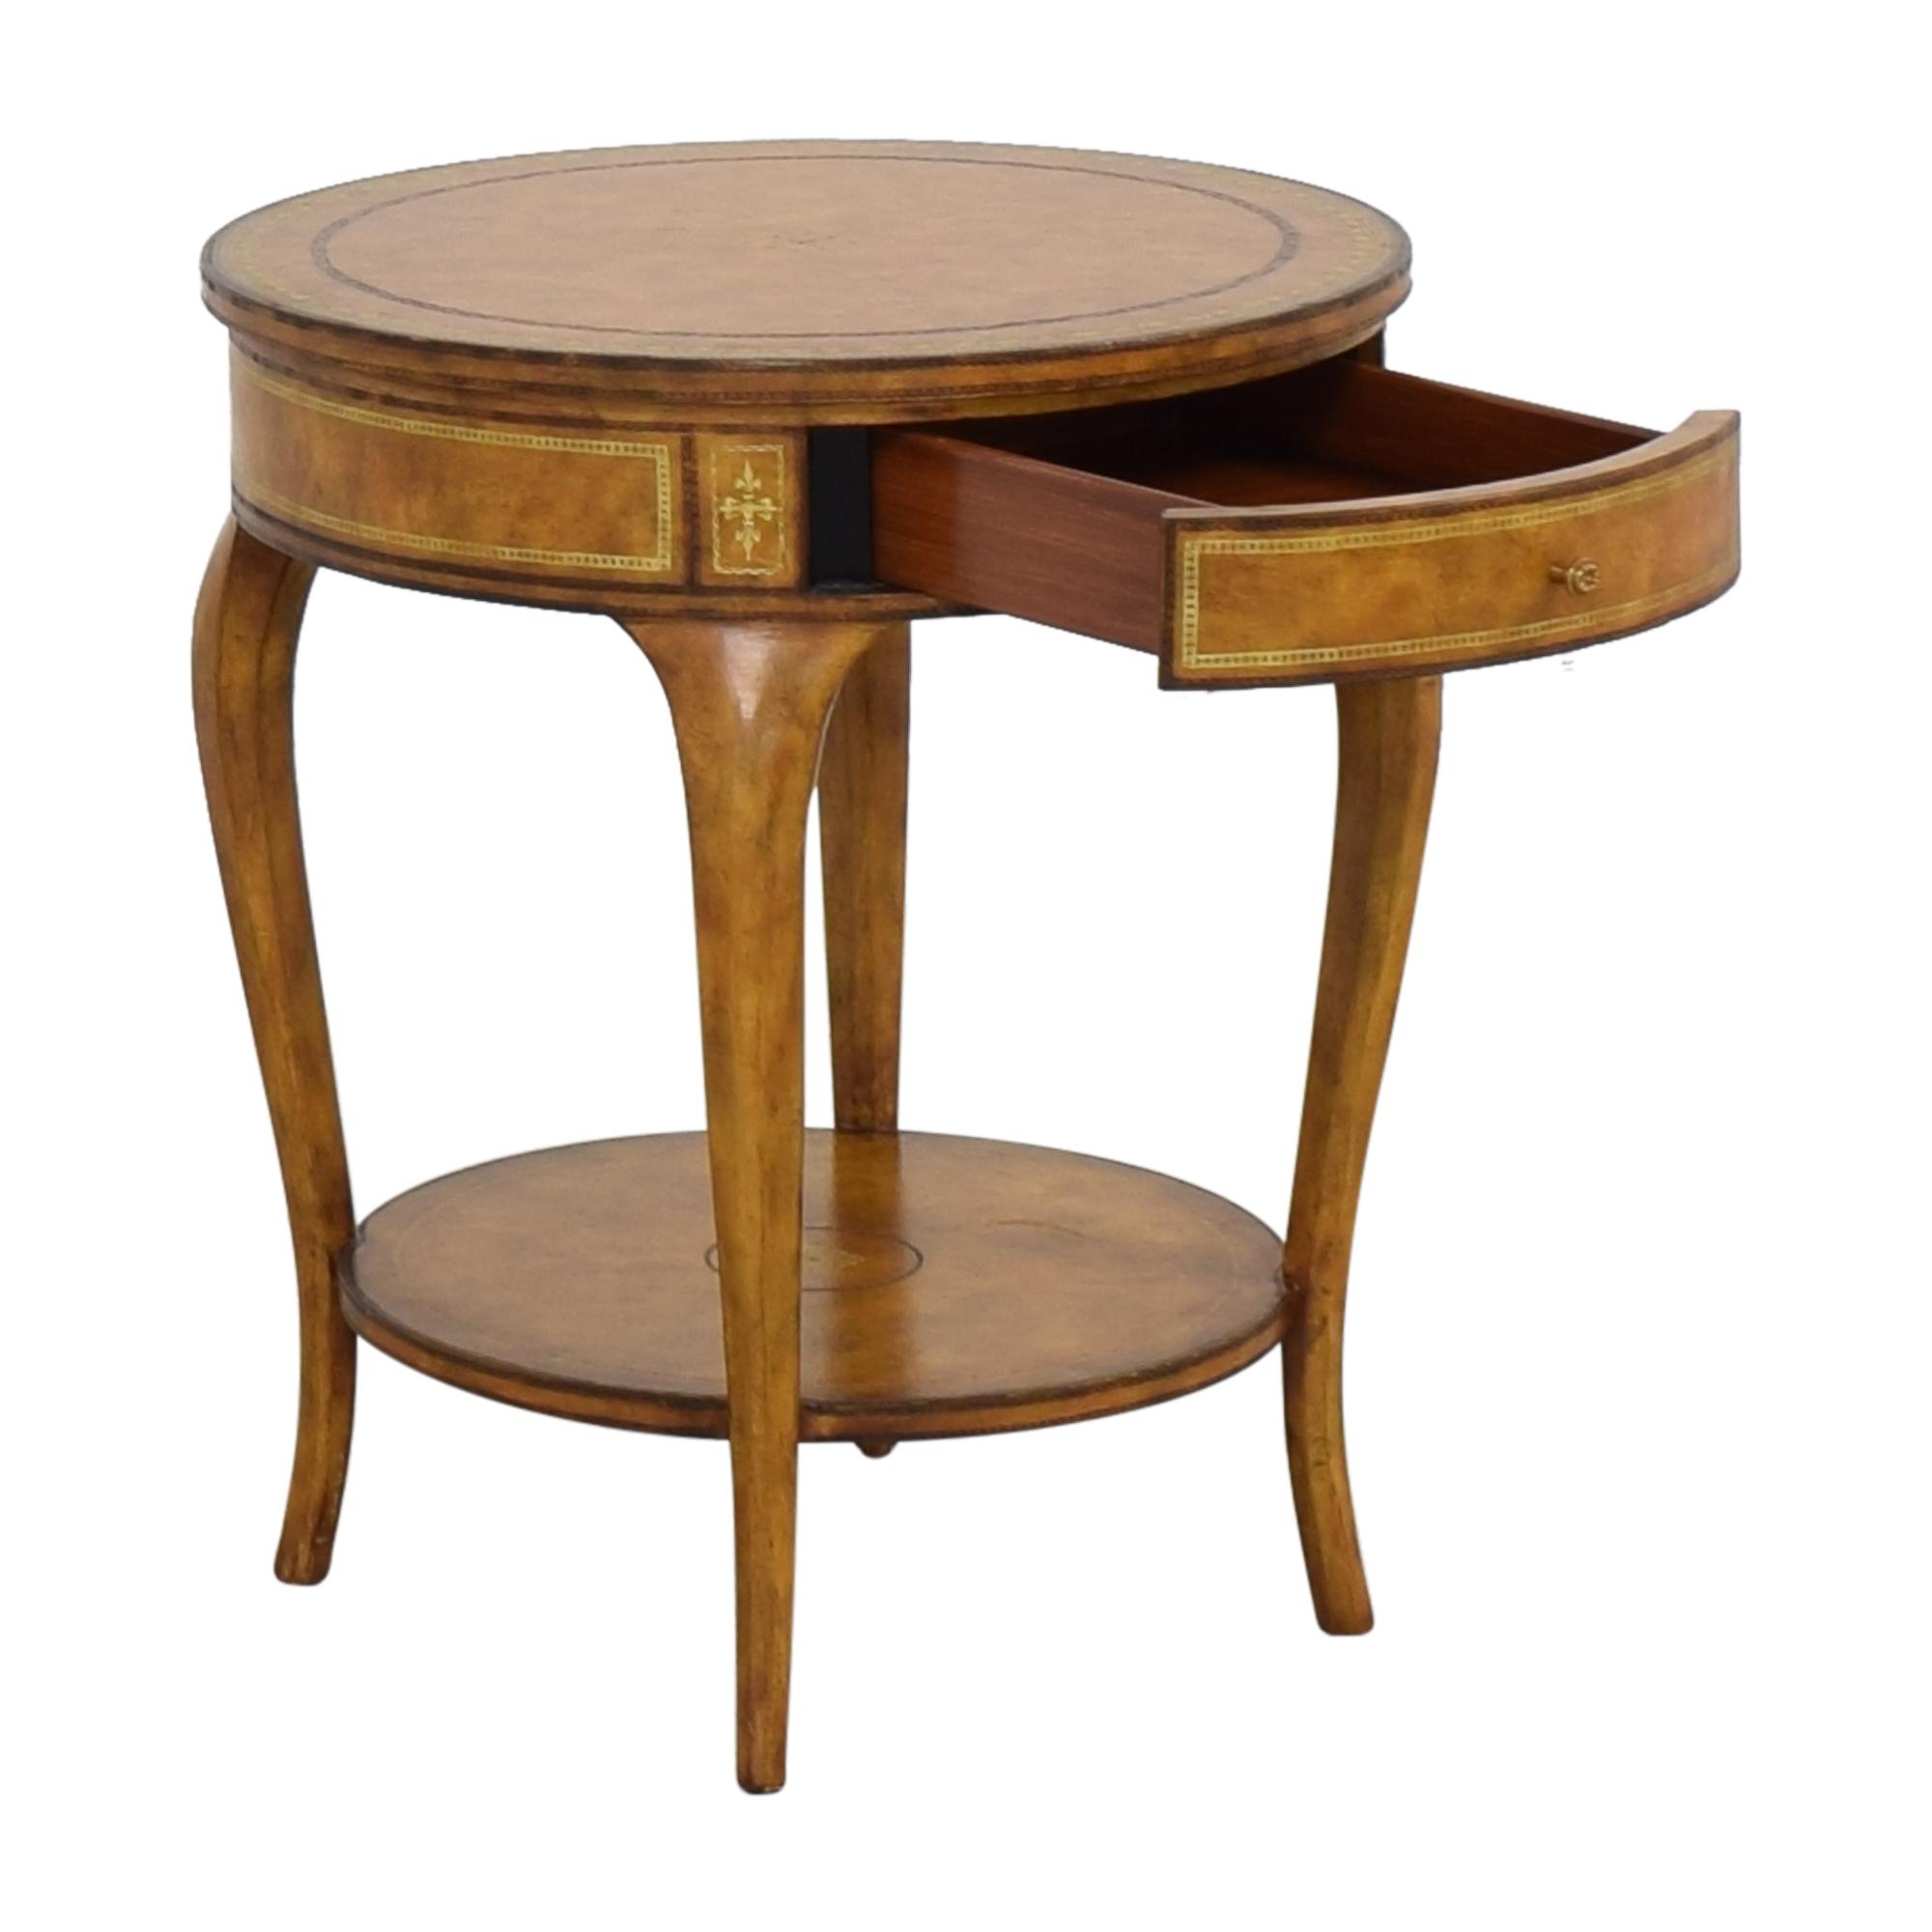 Maitland-Smith Maitland-Smith Round Accent Table on sale